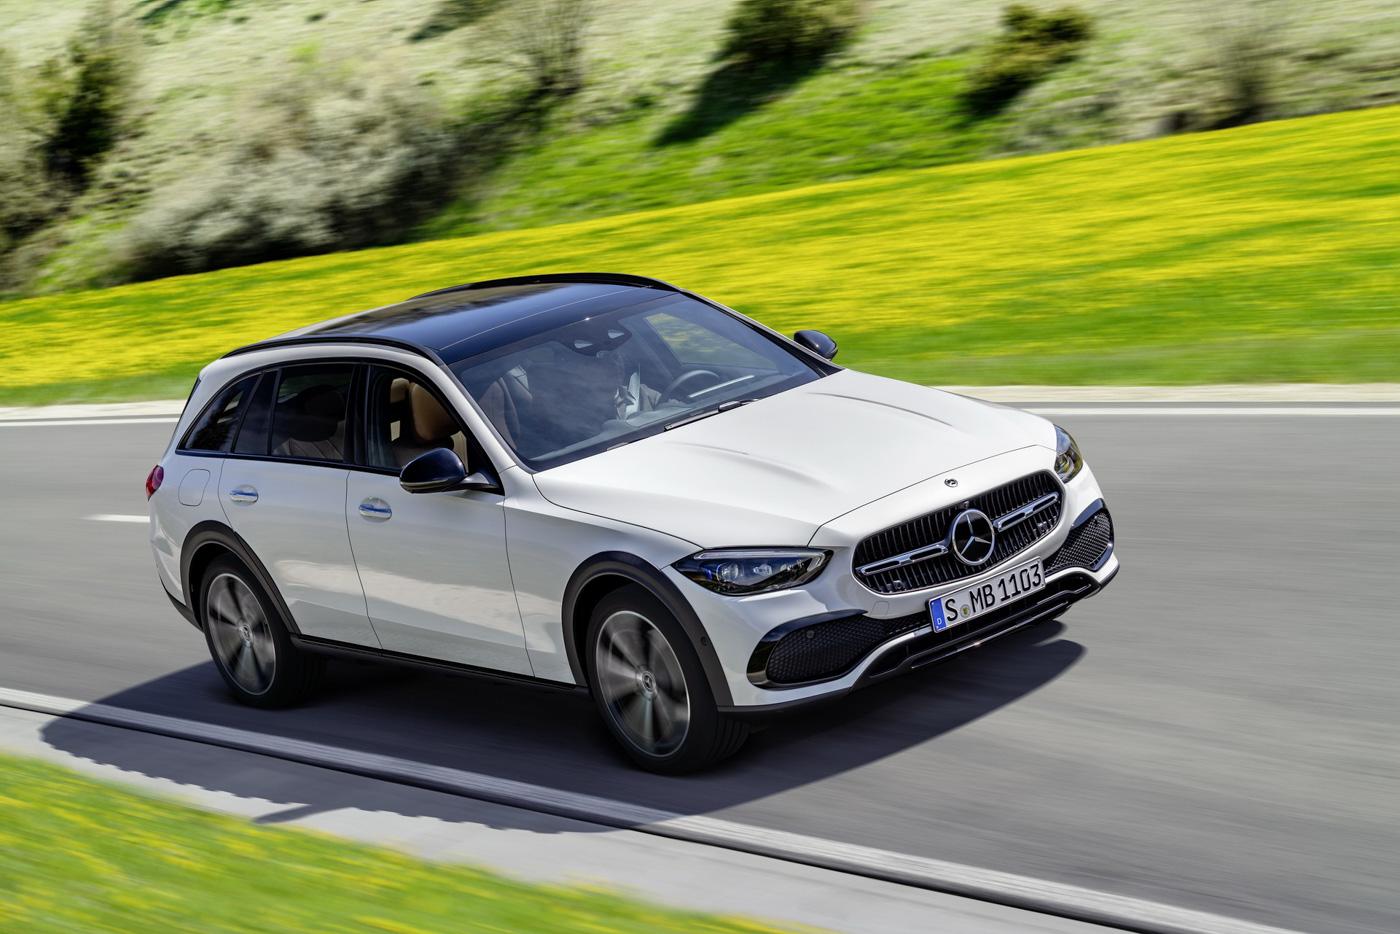 Mercedes-benz-c-class-all-terrain-di-den-moi-noi-cung-mau-xe-gia-dinh-day-thuc-dung (6).JPG